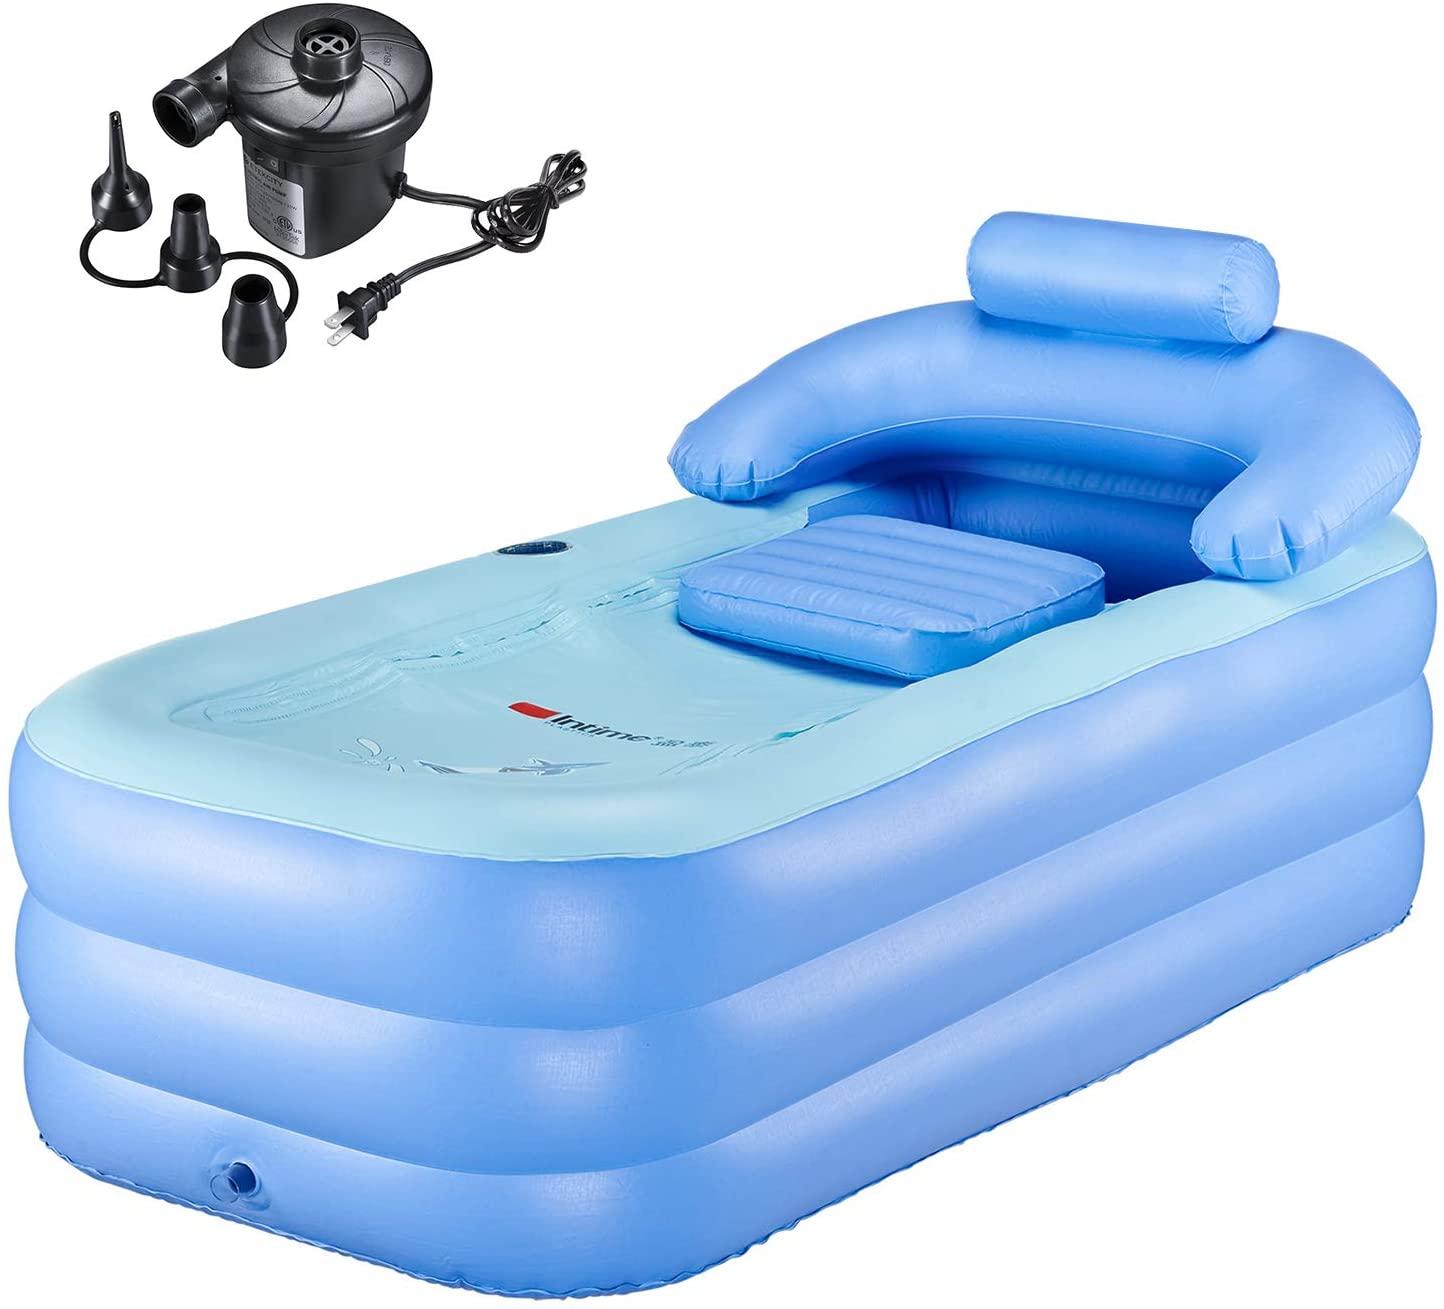 PENSON & CO. Inflatable Bath Tub PVC Portable Bathtub for Adult Bathroom SPA with Electric Air Pump